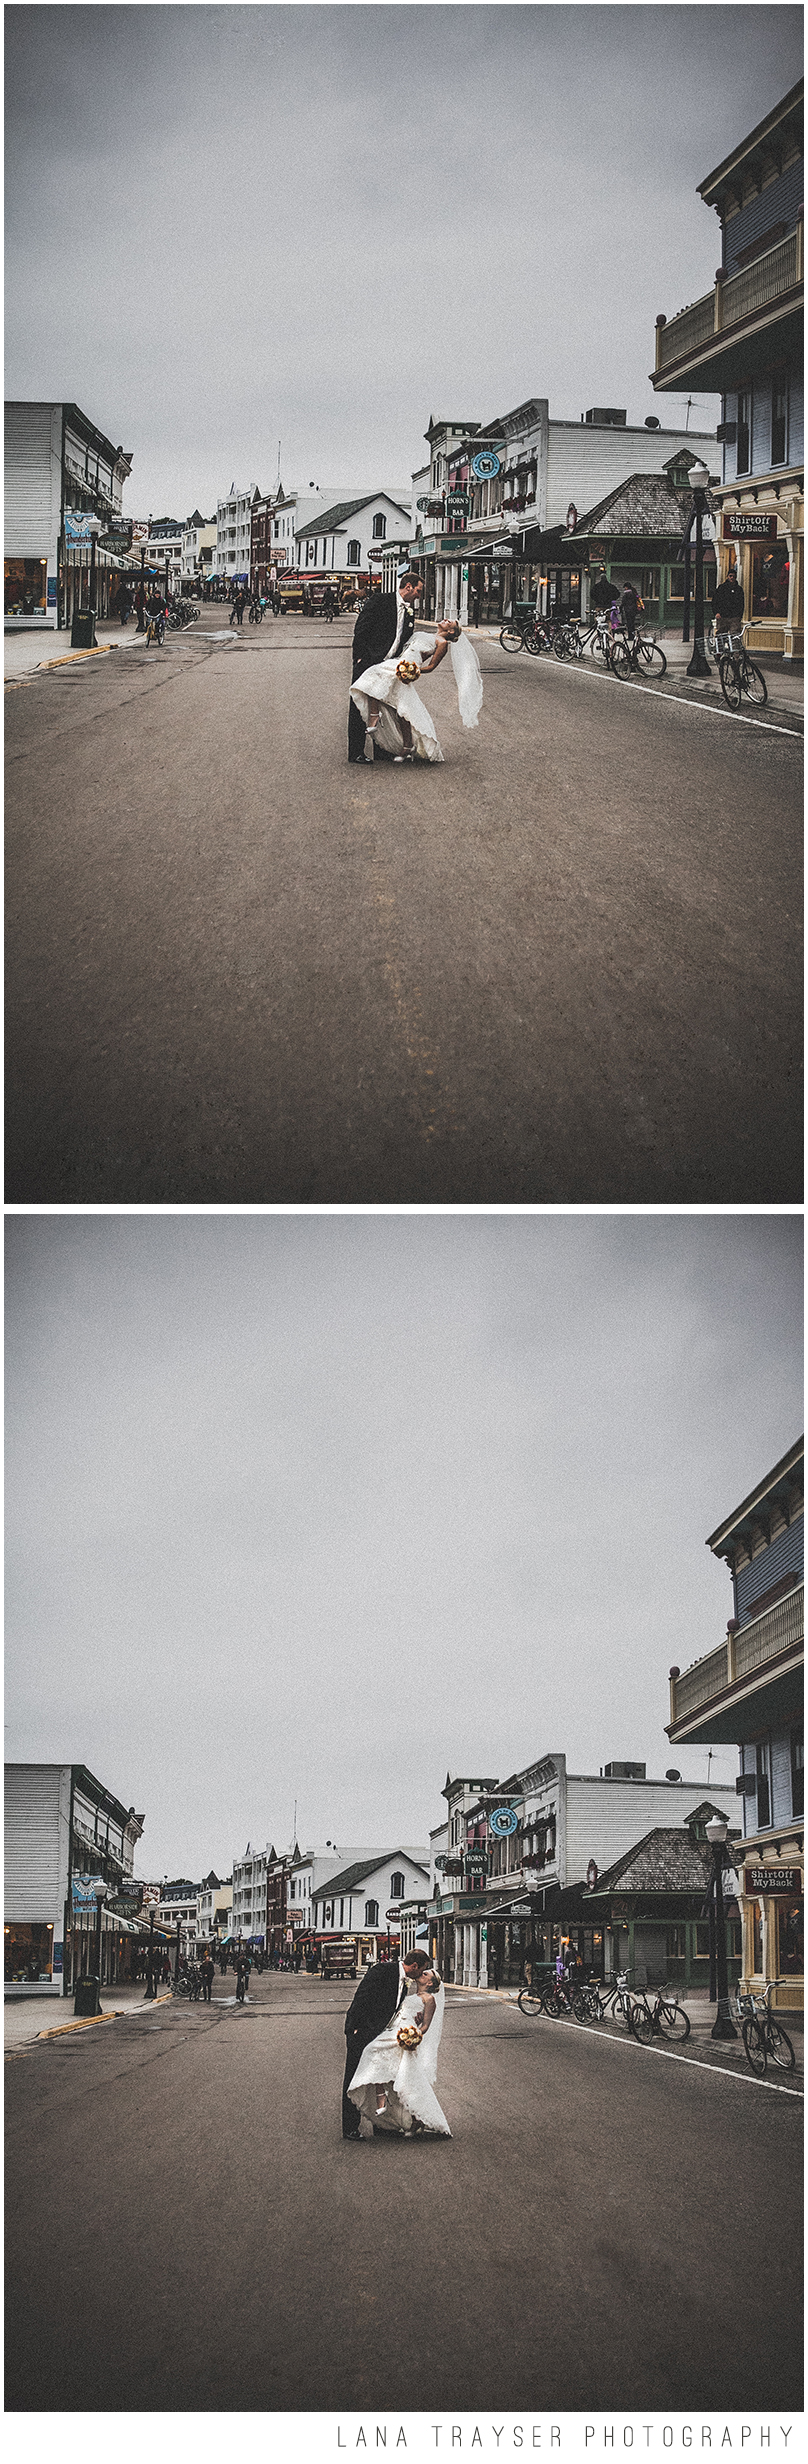 Blog Collage-1383251850489